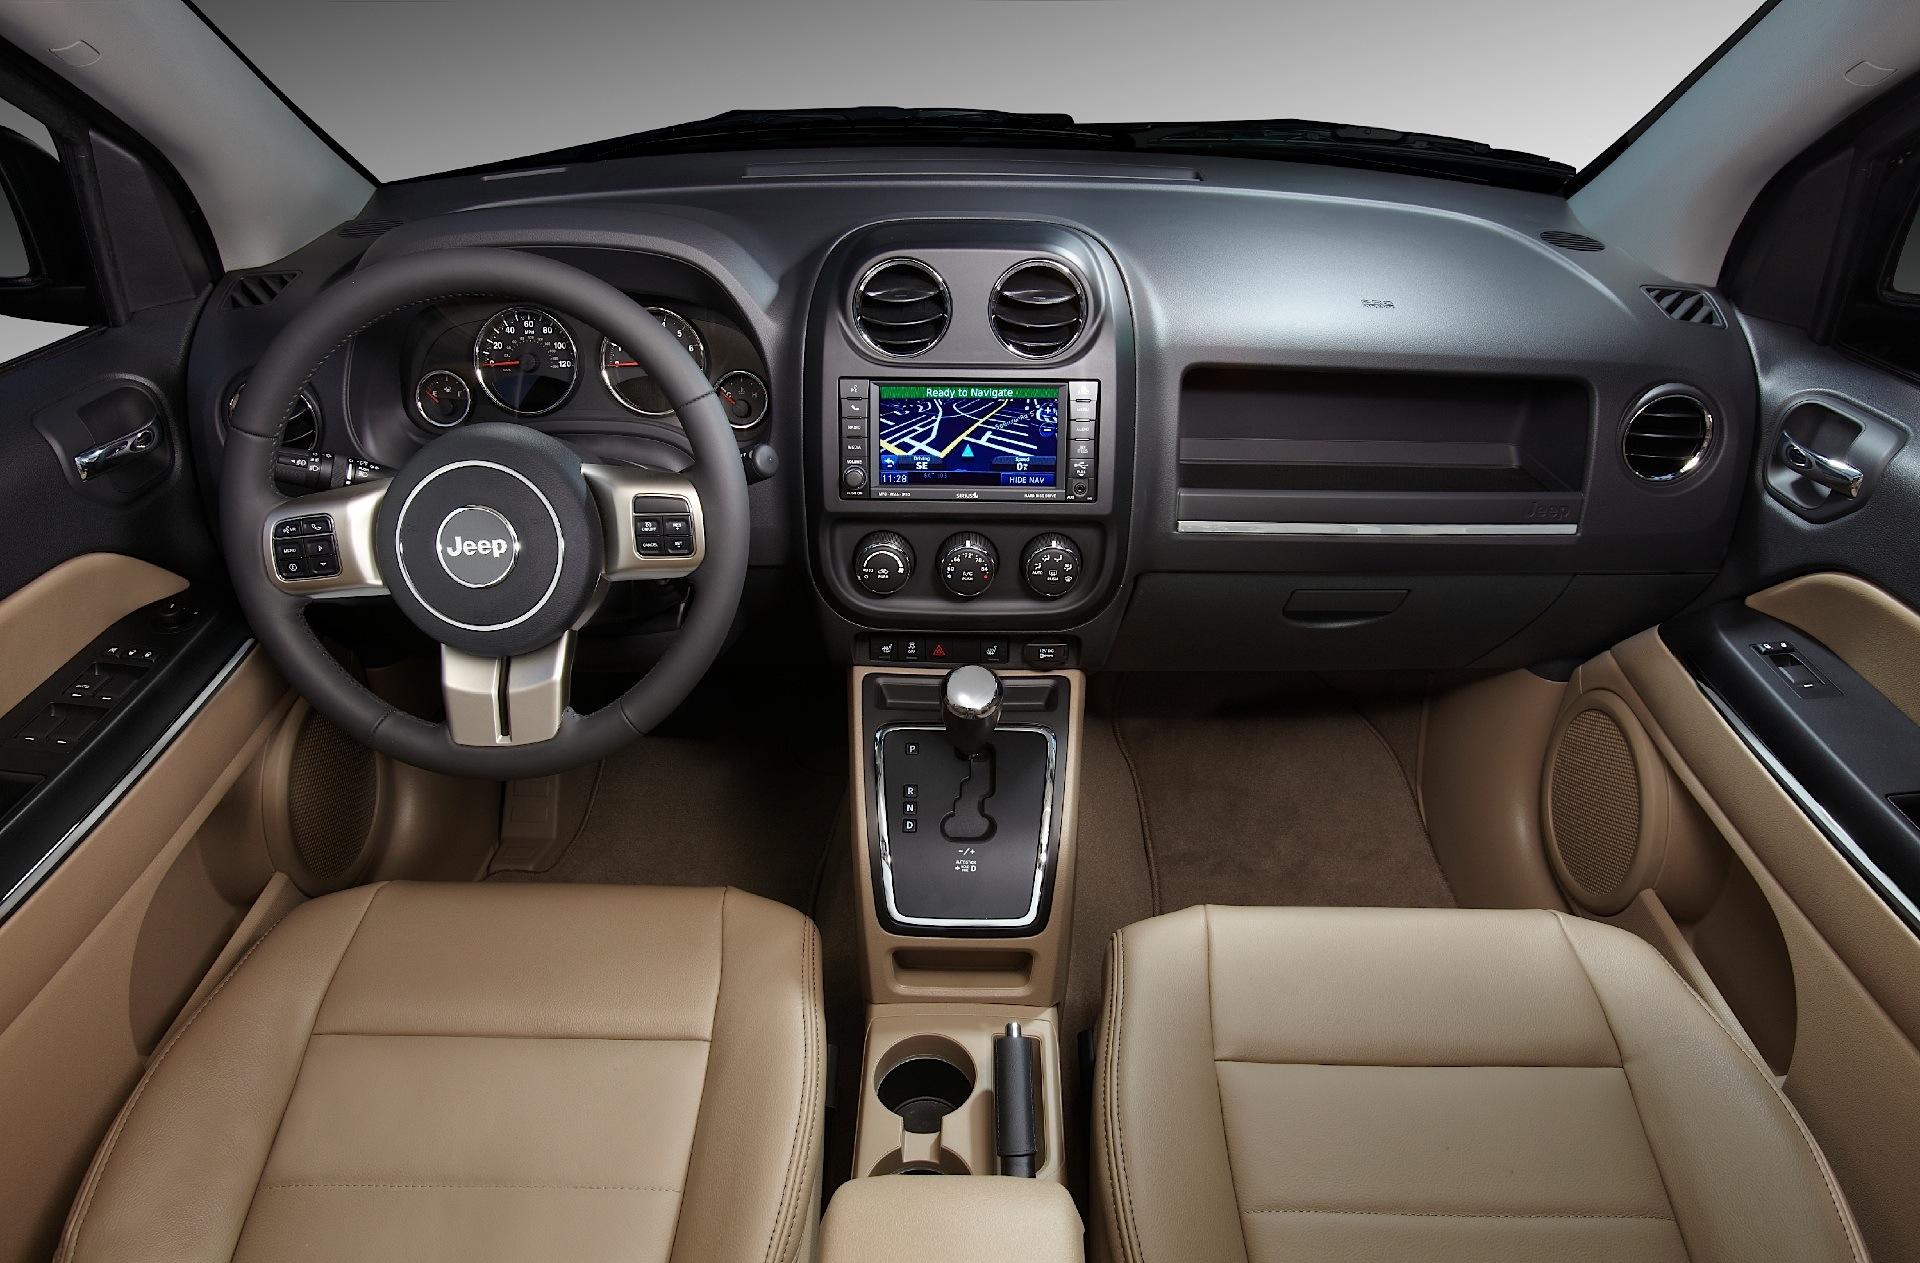 jeep compass specs 2011 2012 2013 2014 2015 2016 autoevolution. Black Bedroom Furniture Sets. Home Design Ideas